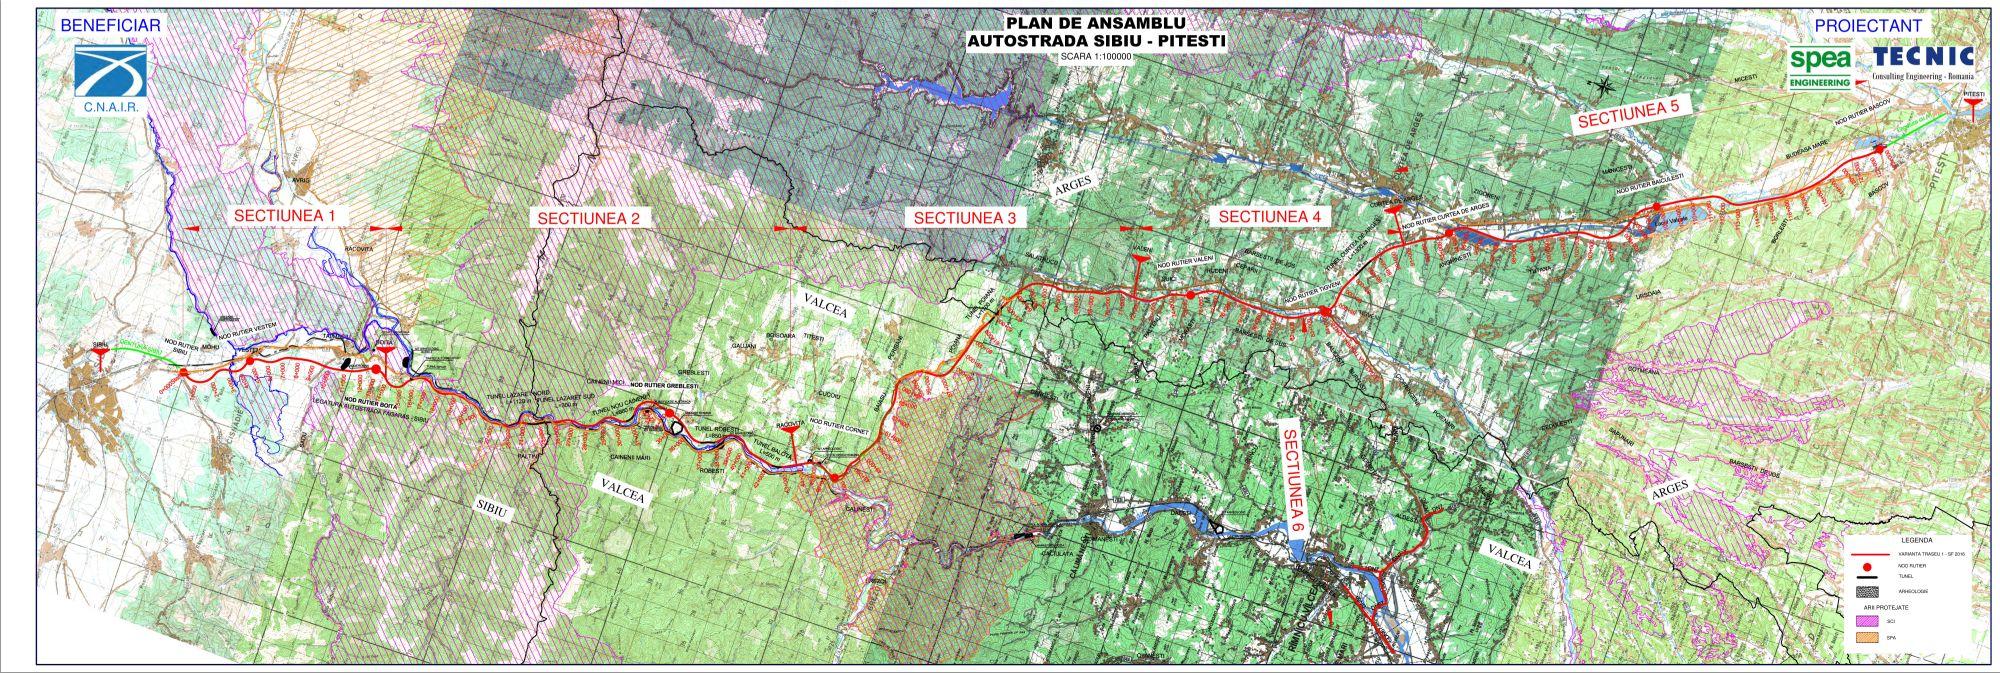 Harta Autostrada Sibiu Pitesti Vezi Traseul Final Autoexpert